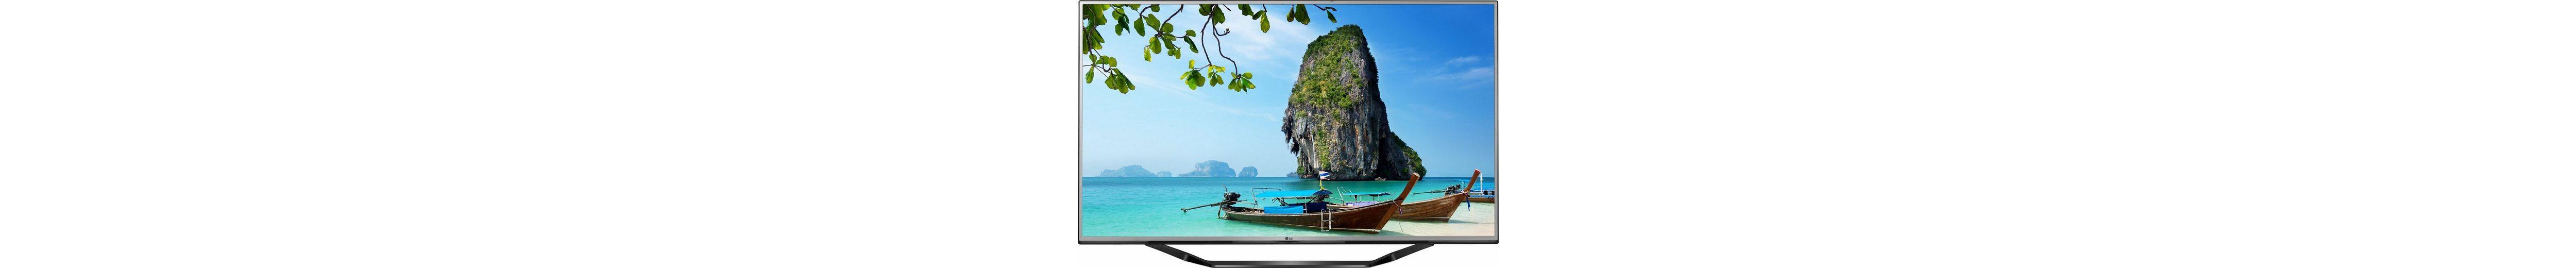 LG 65UH625V, LED Fernseher, 164 cm (65 Zoll), 2160p (4K Ultra HD), Smart-TV